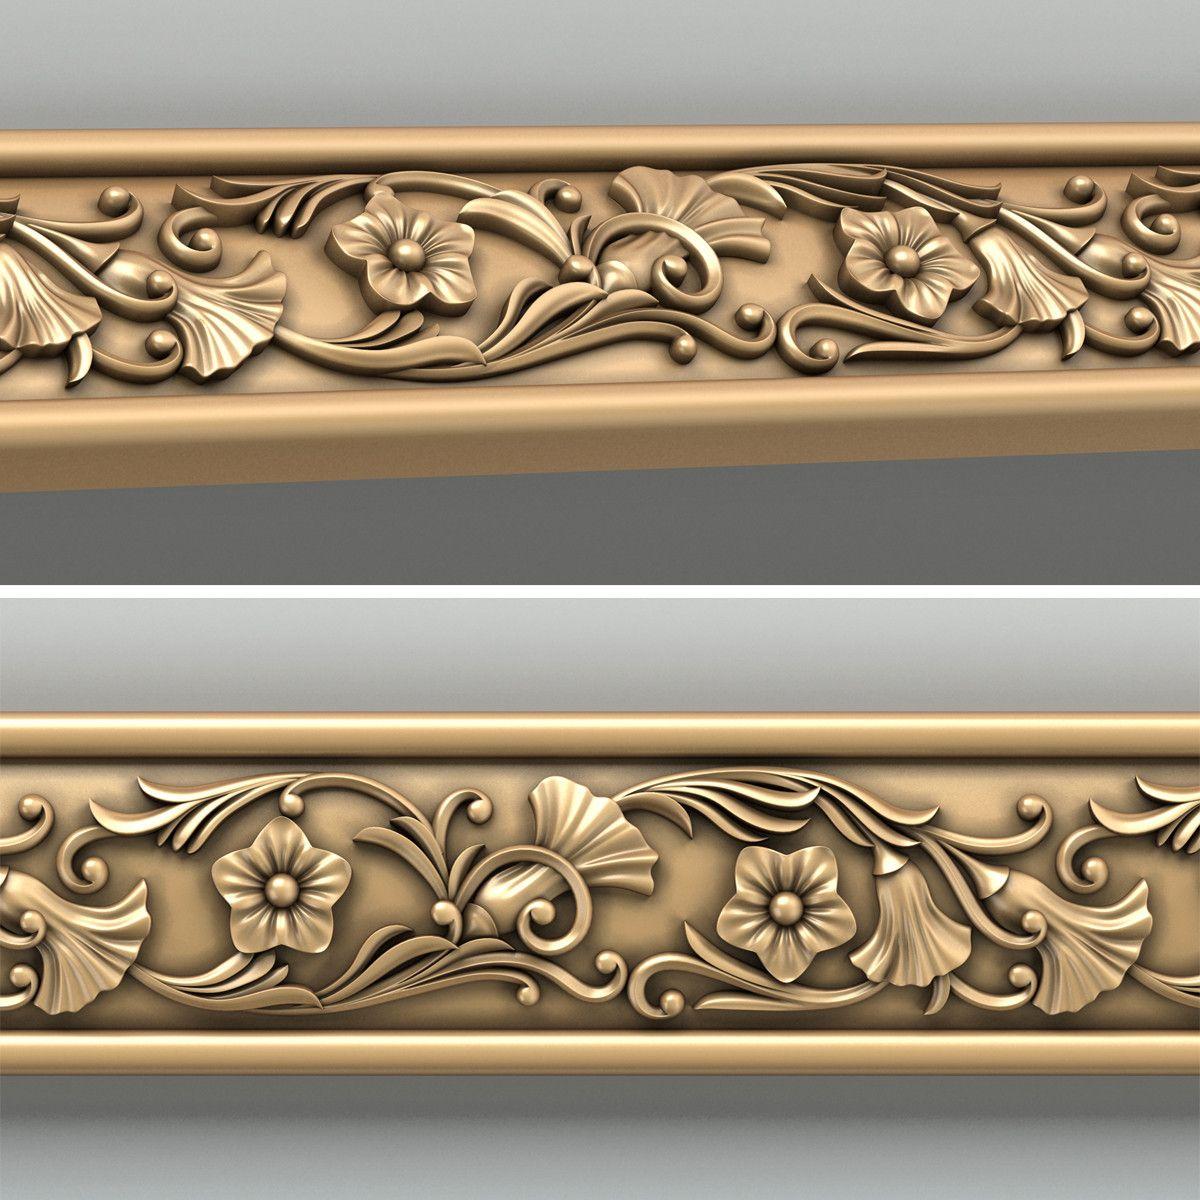 Wonderful 3d Decorative Molding Model